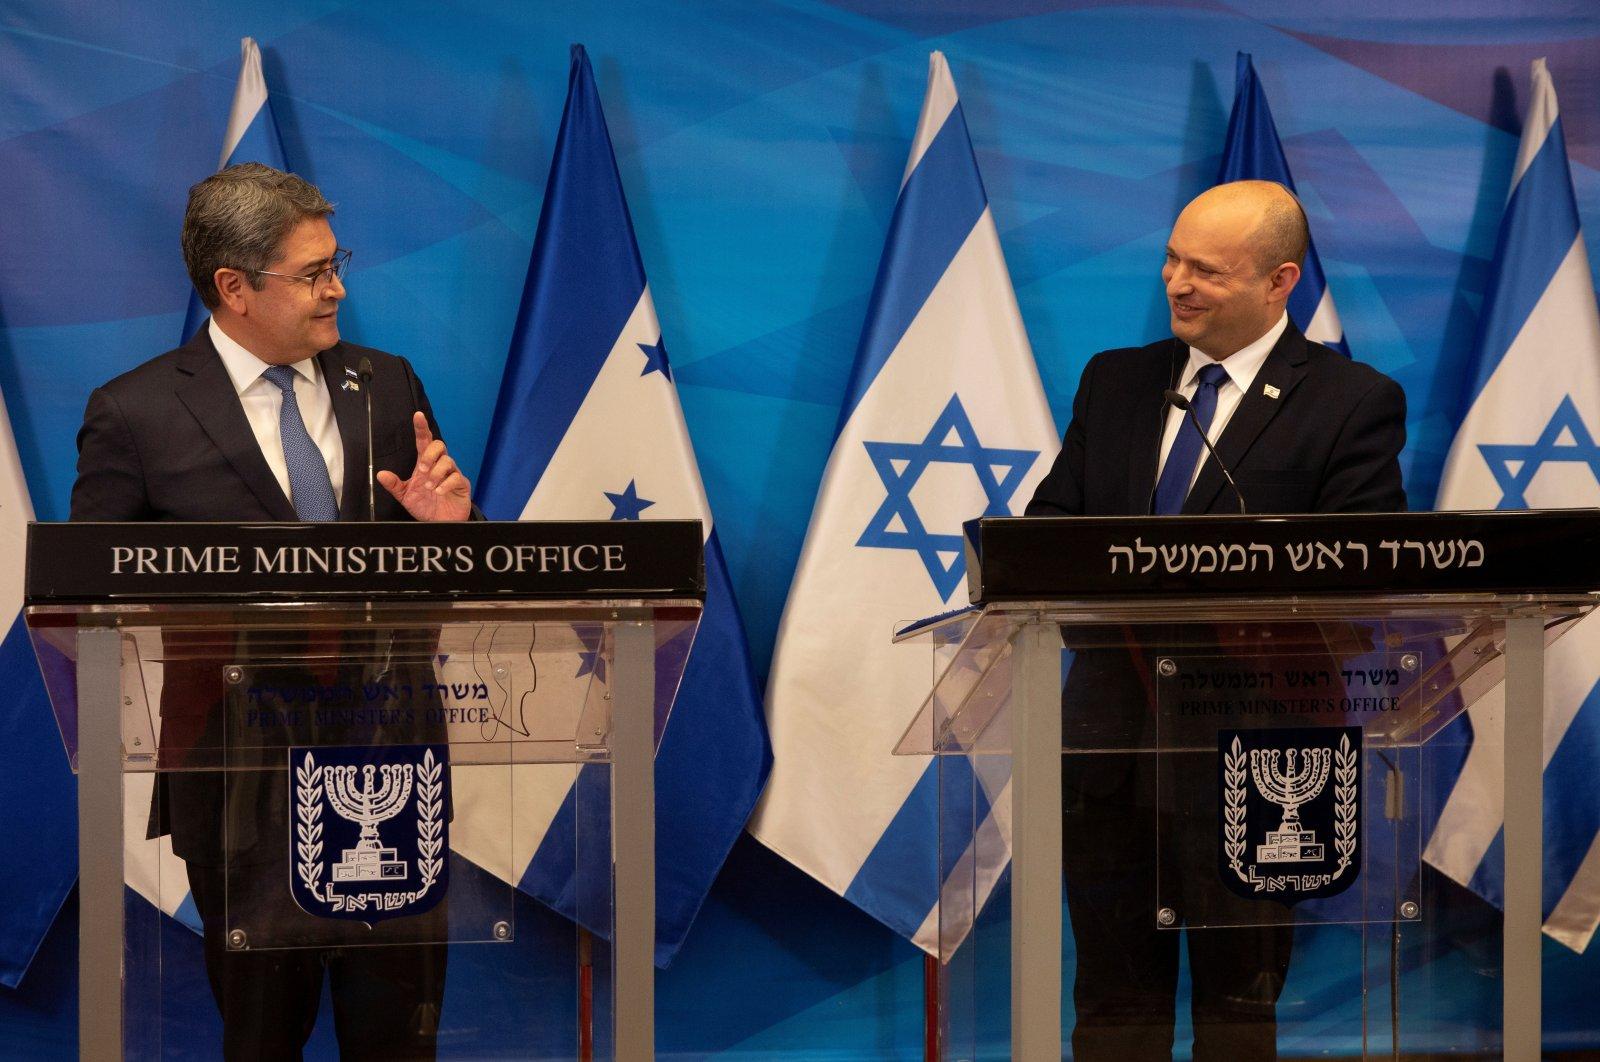 Israeli Prime Minister Naftali Bennett and Honduran President Juan Orlando Hernandez attend a joint statement at the Prime Minister's Office in West Jerusalem, Israel, June 24, 2021. (Reuters Photo)